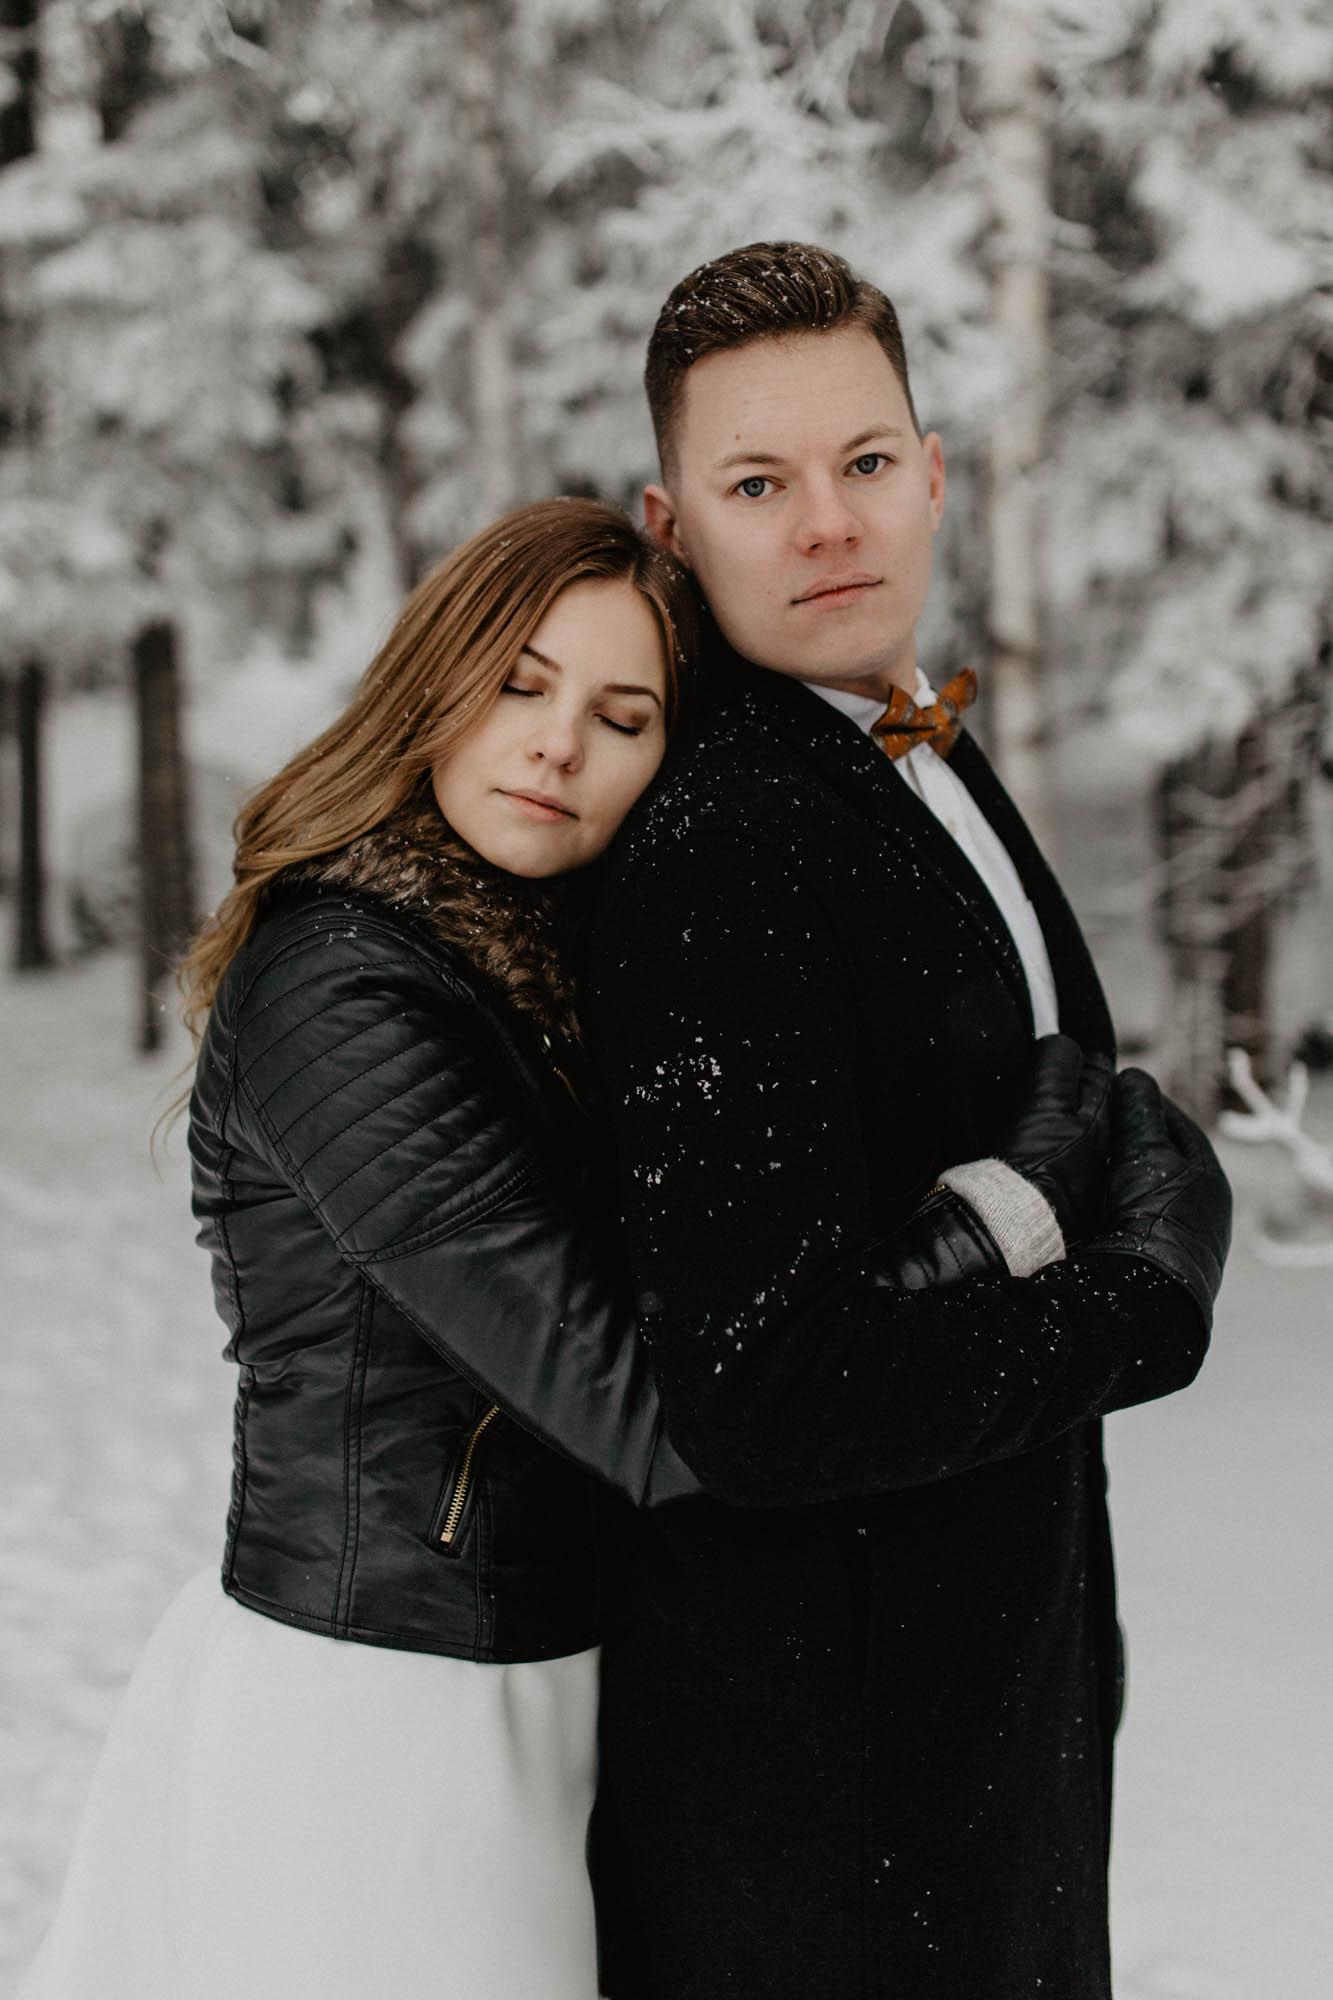 ashley_schulman_photography-winter_wedding_tampere-41.jpg